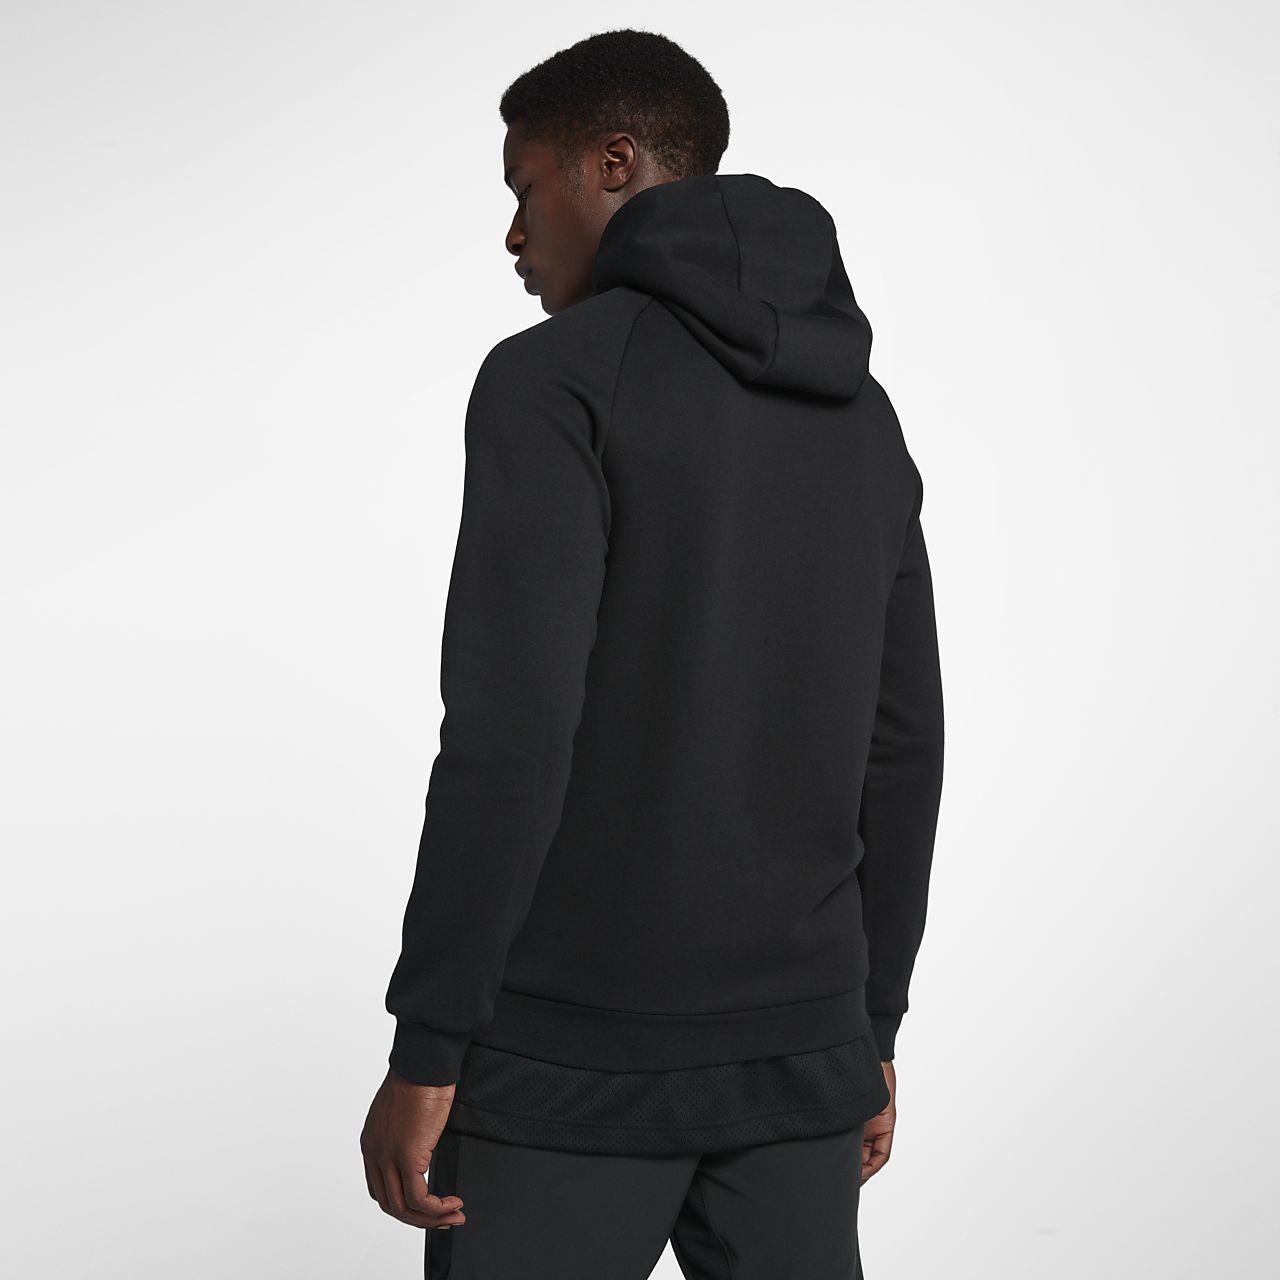 86d59c4d9fc Jordan Jumpman Men's Fleece Full-Zip Hoodie. Nike.com AU